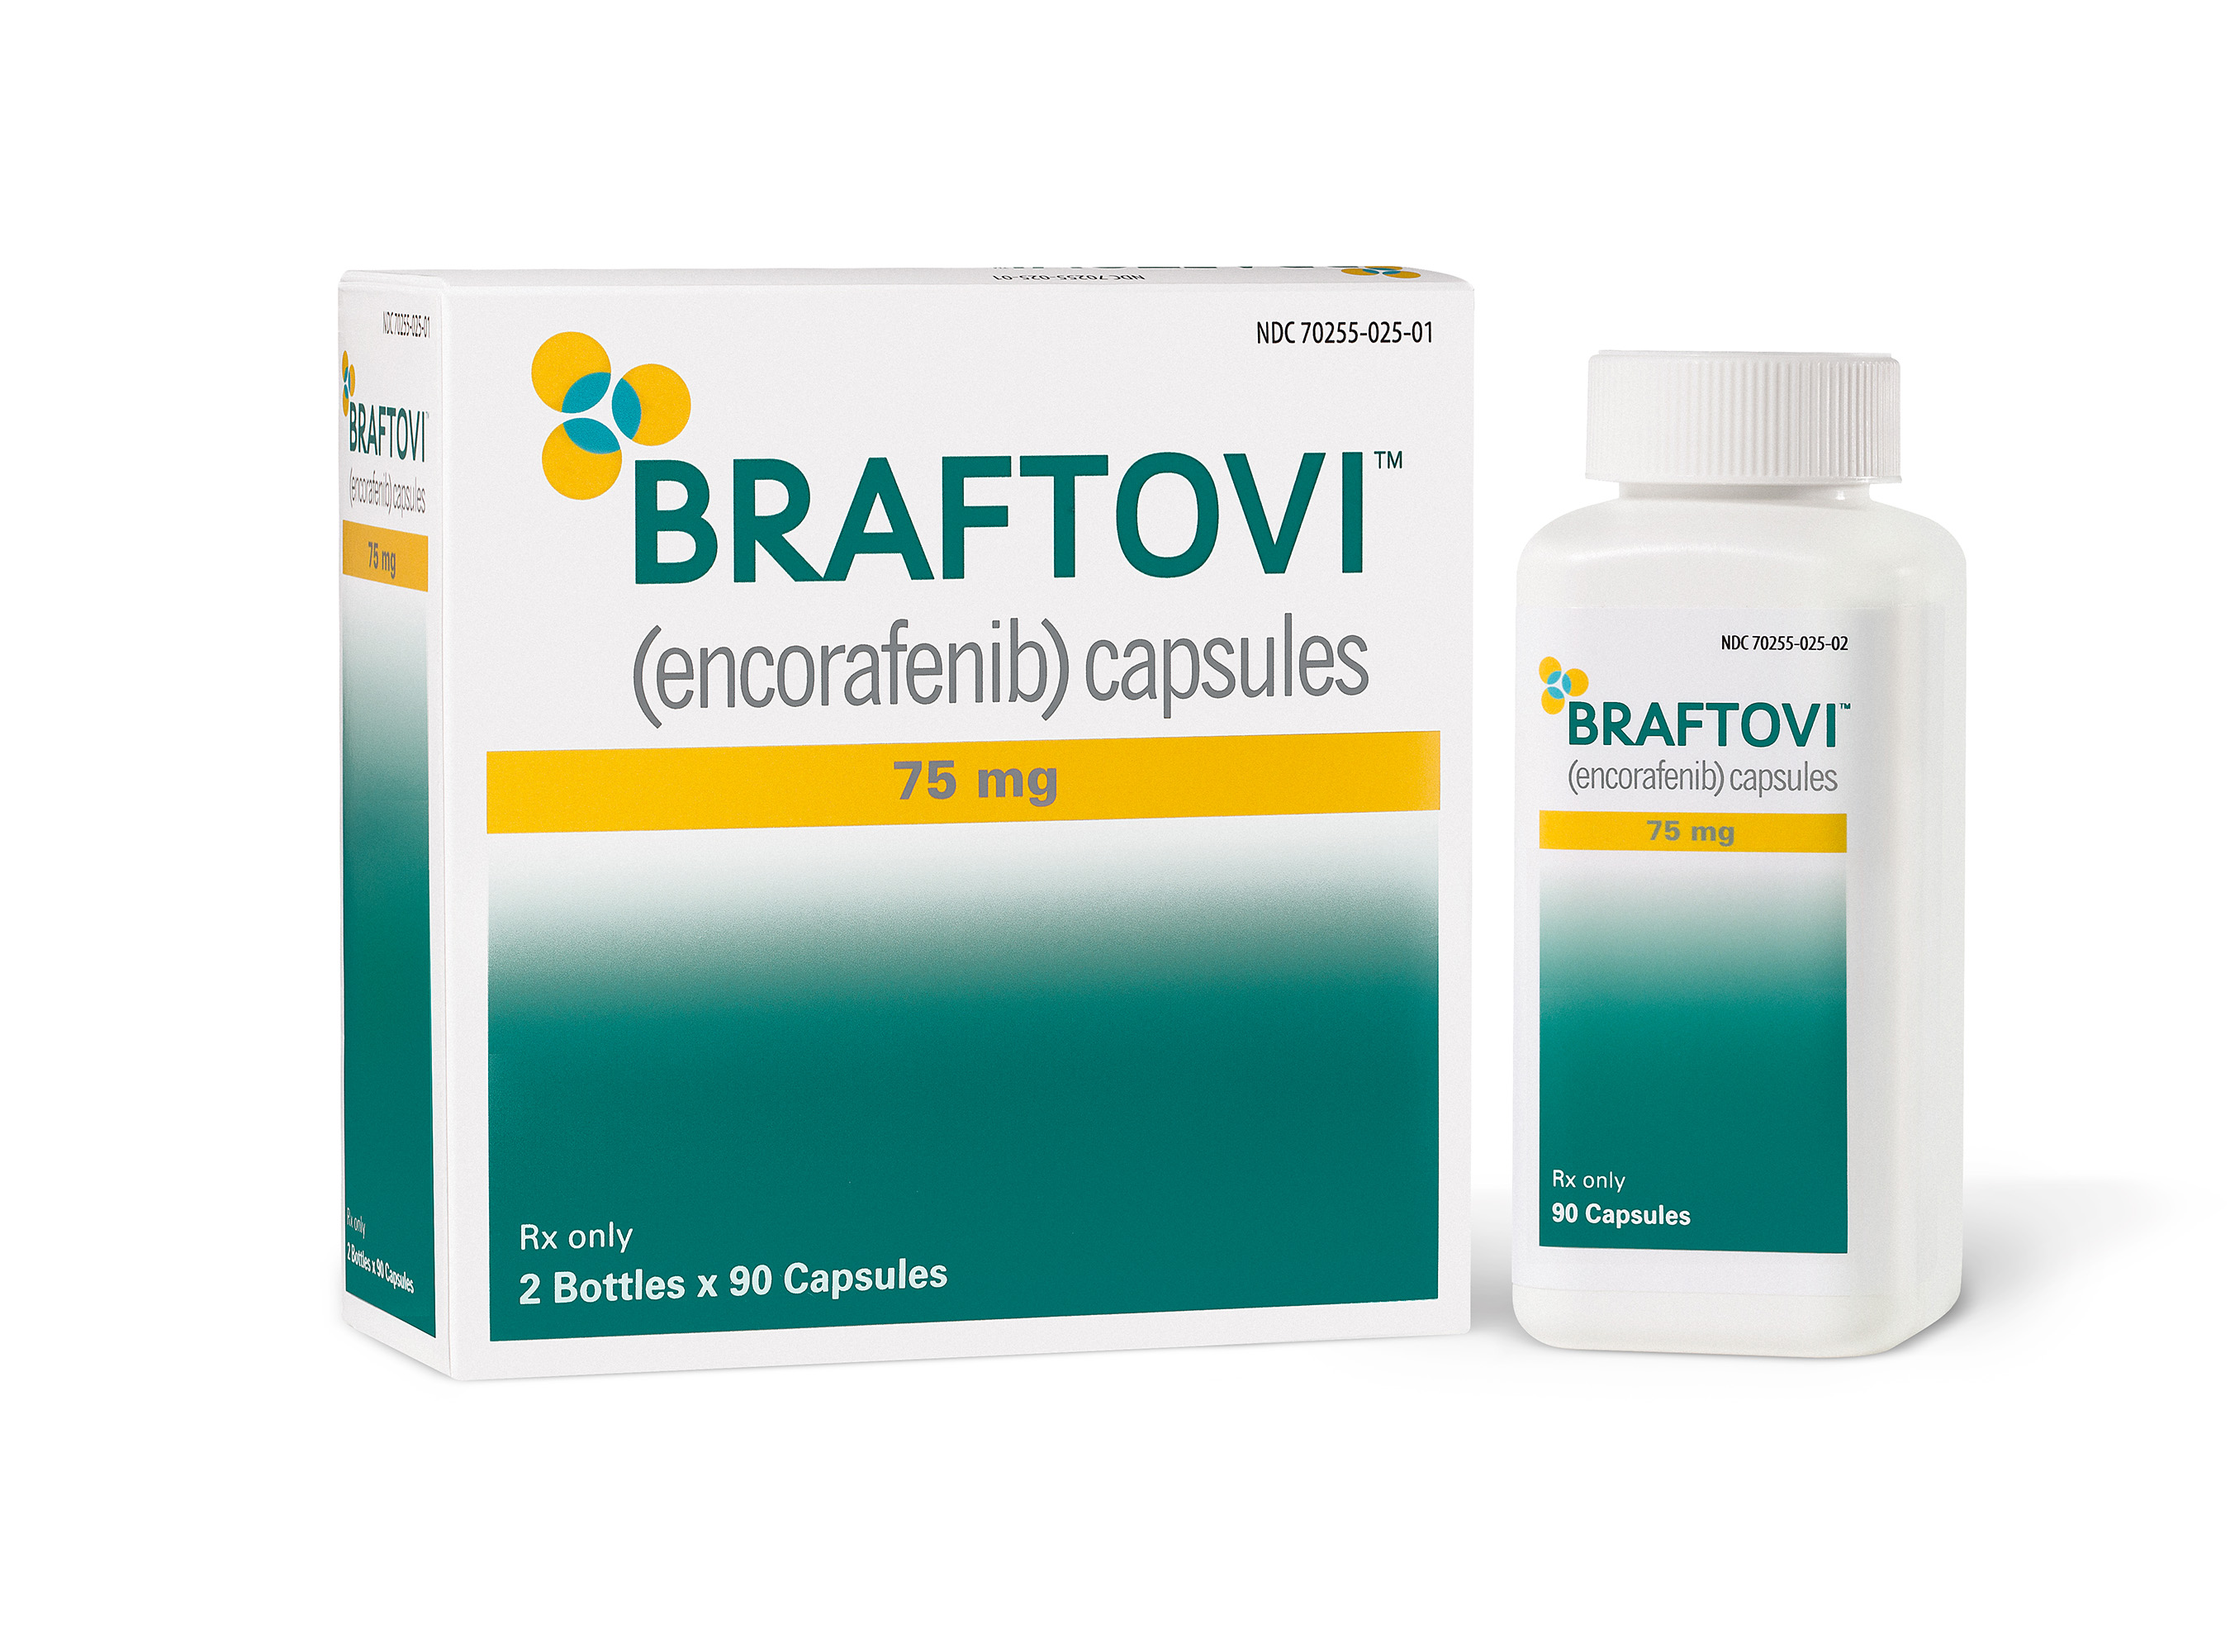 Array BioPharma Announces FDA Approval of BRAFTOVI